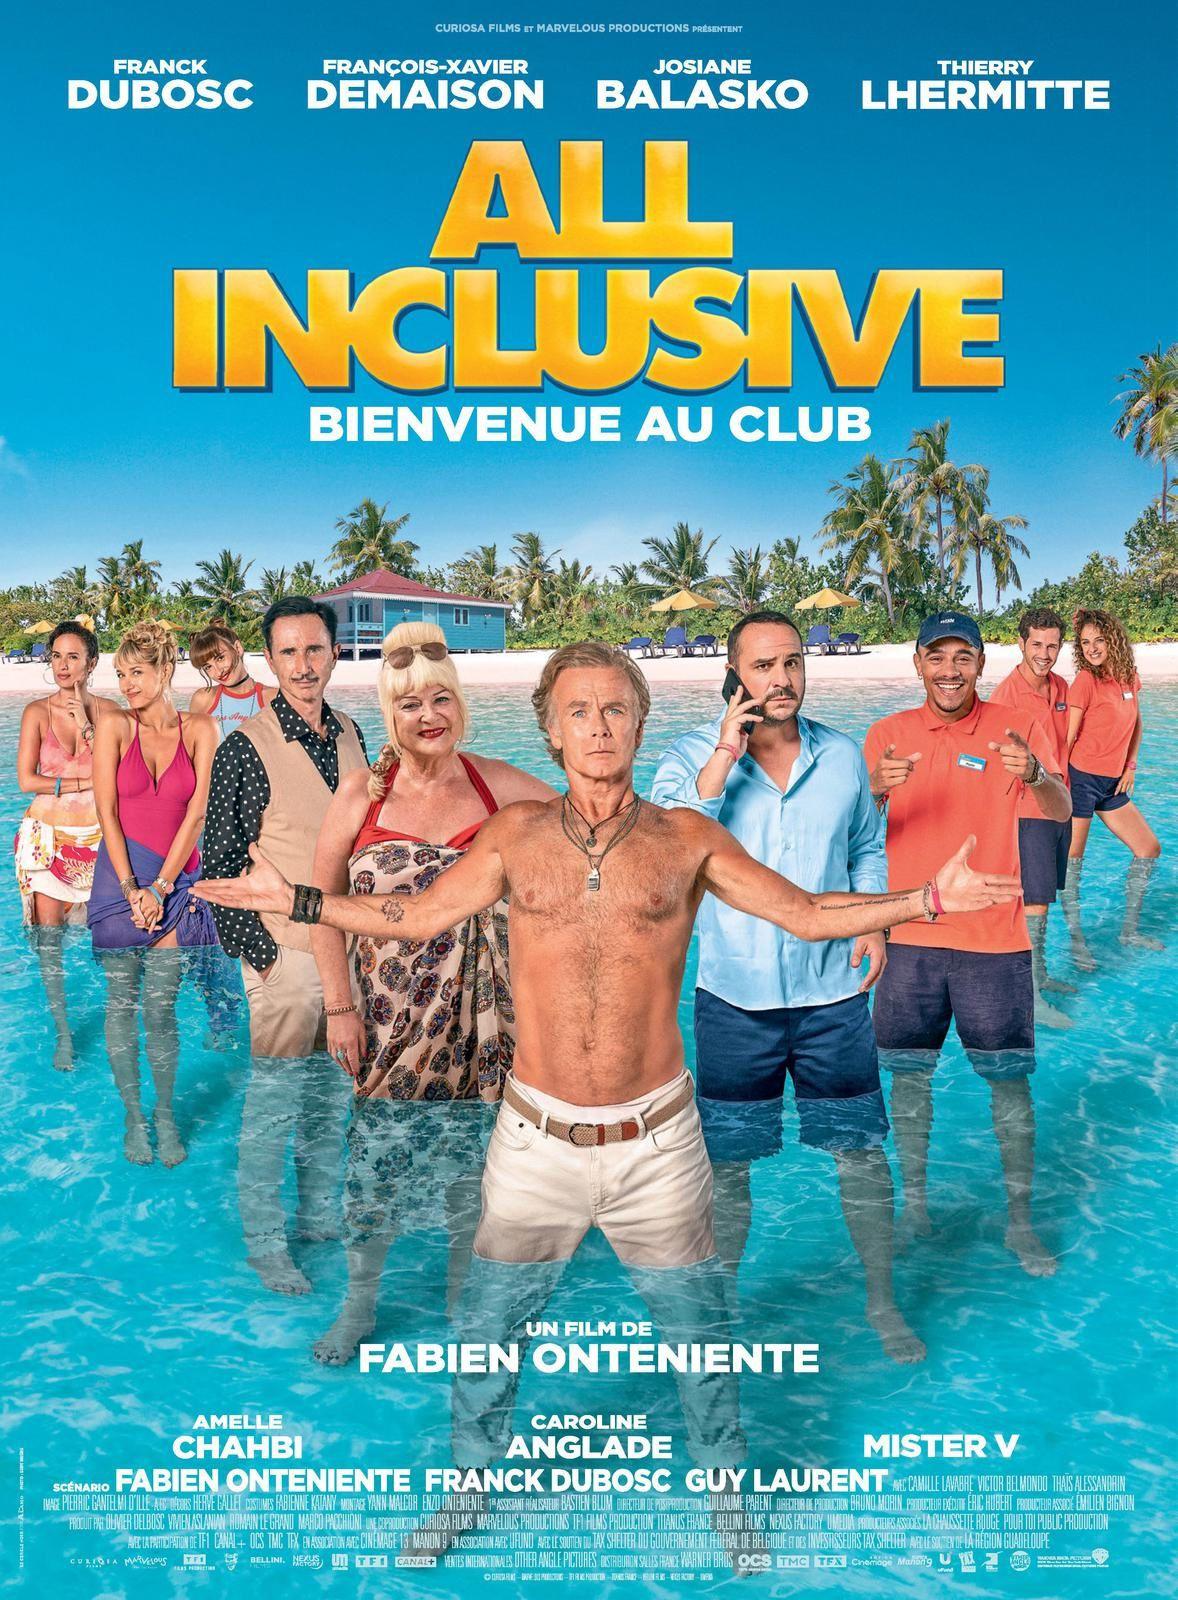 #Cinema - Franck Dubosc - Josiane Balasko -Thierry Lhermitte - DECOUVREZ LA BANDE ANNONCE DE ALL INCLUSIVE !